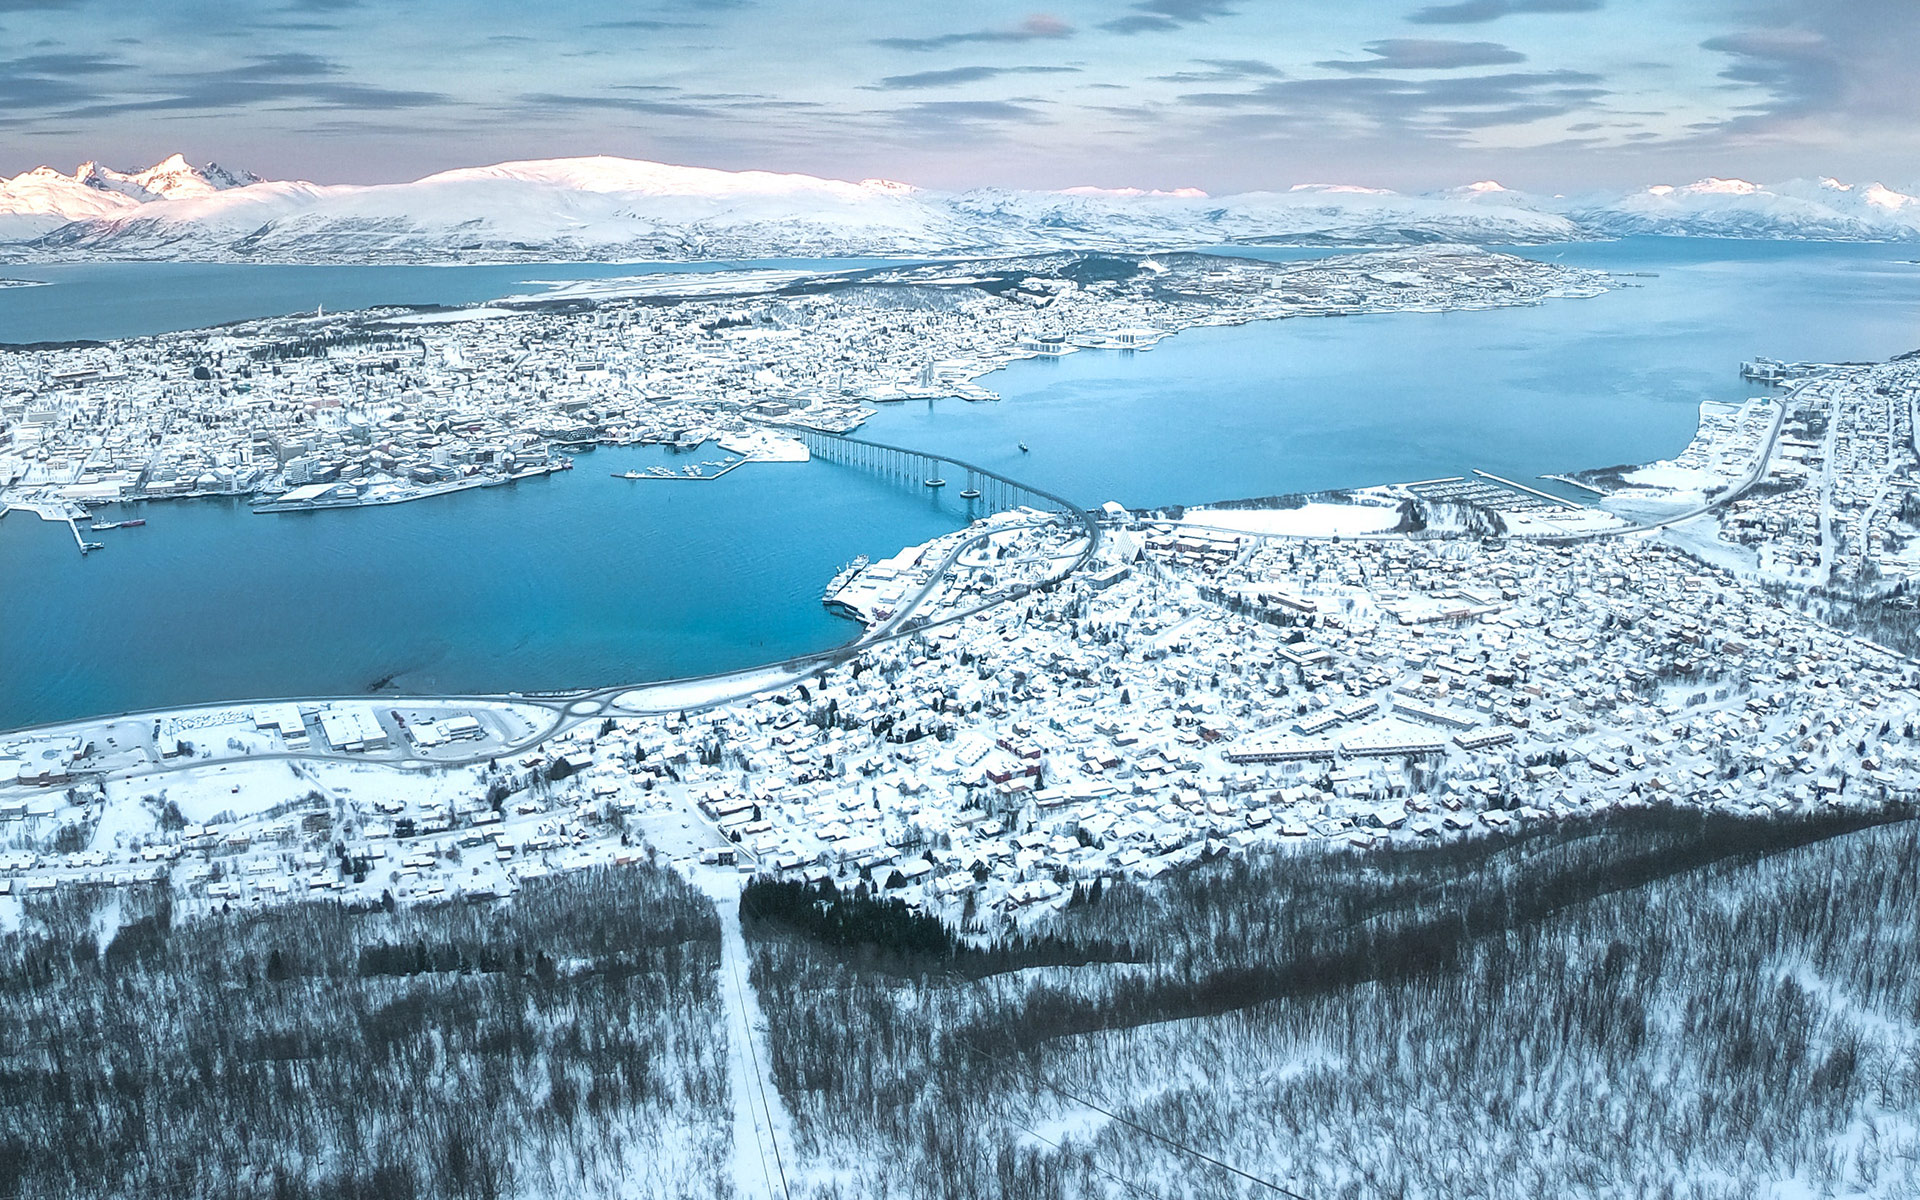 Tromsø seen from Mount Storsteinen © Tobias Bjørkli